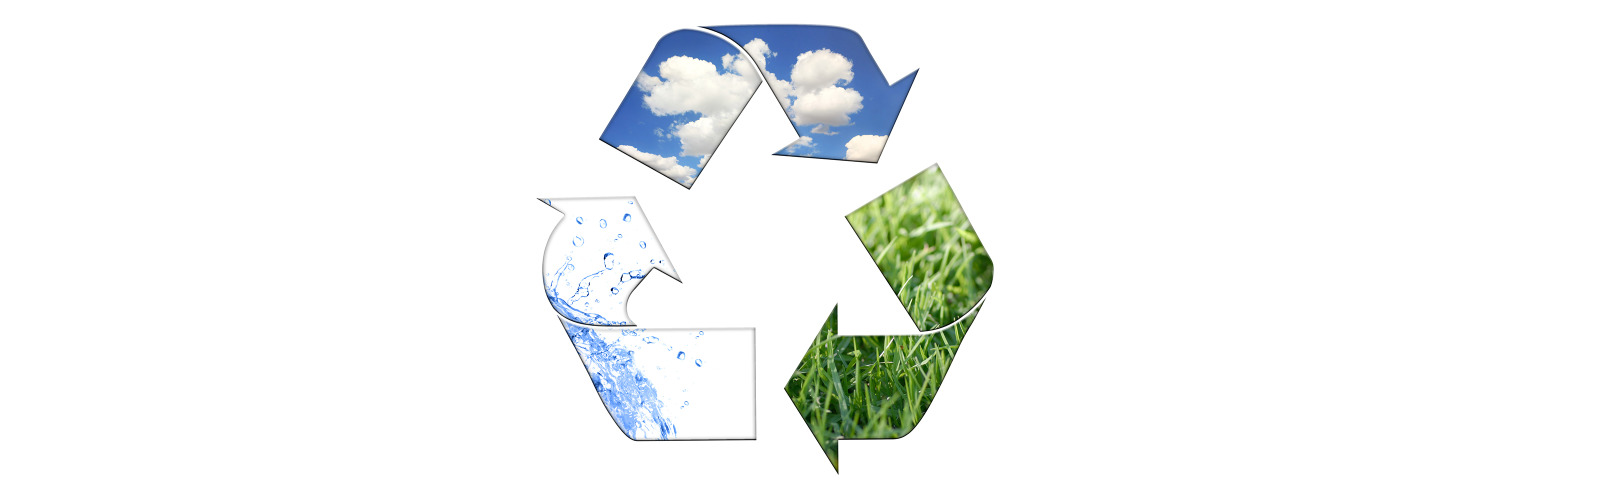 recycling_original.jpg